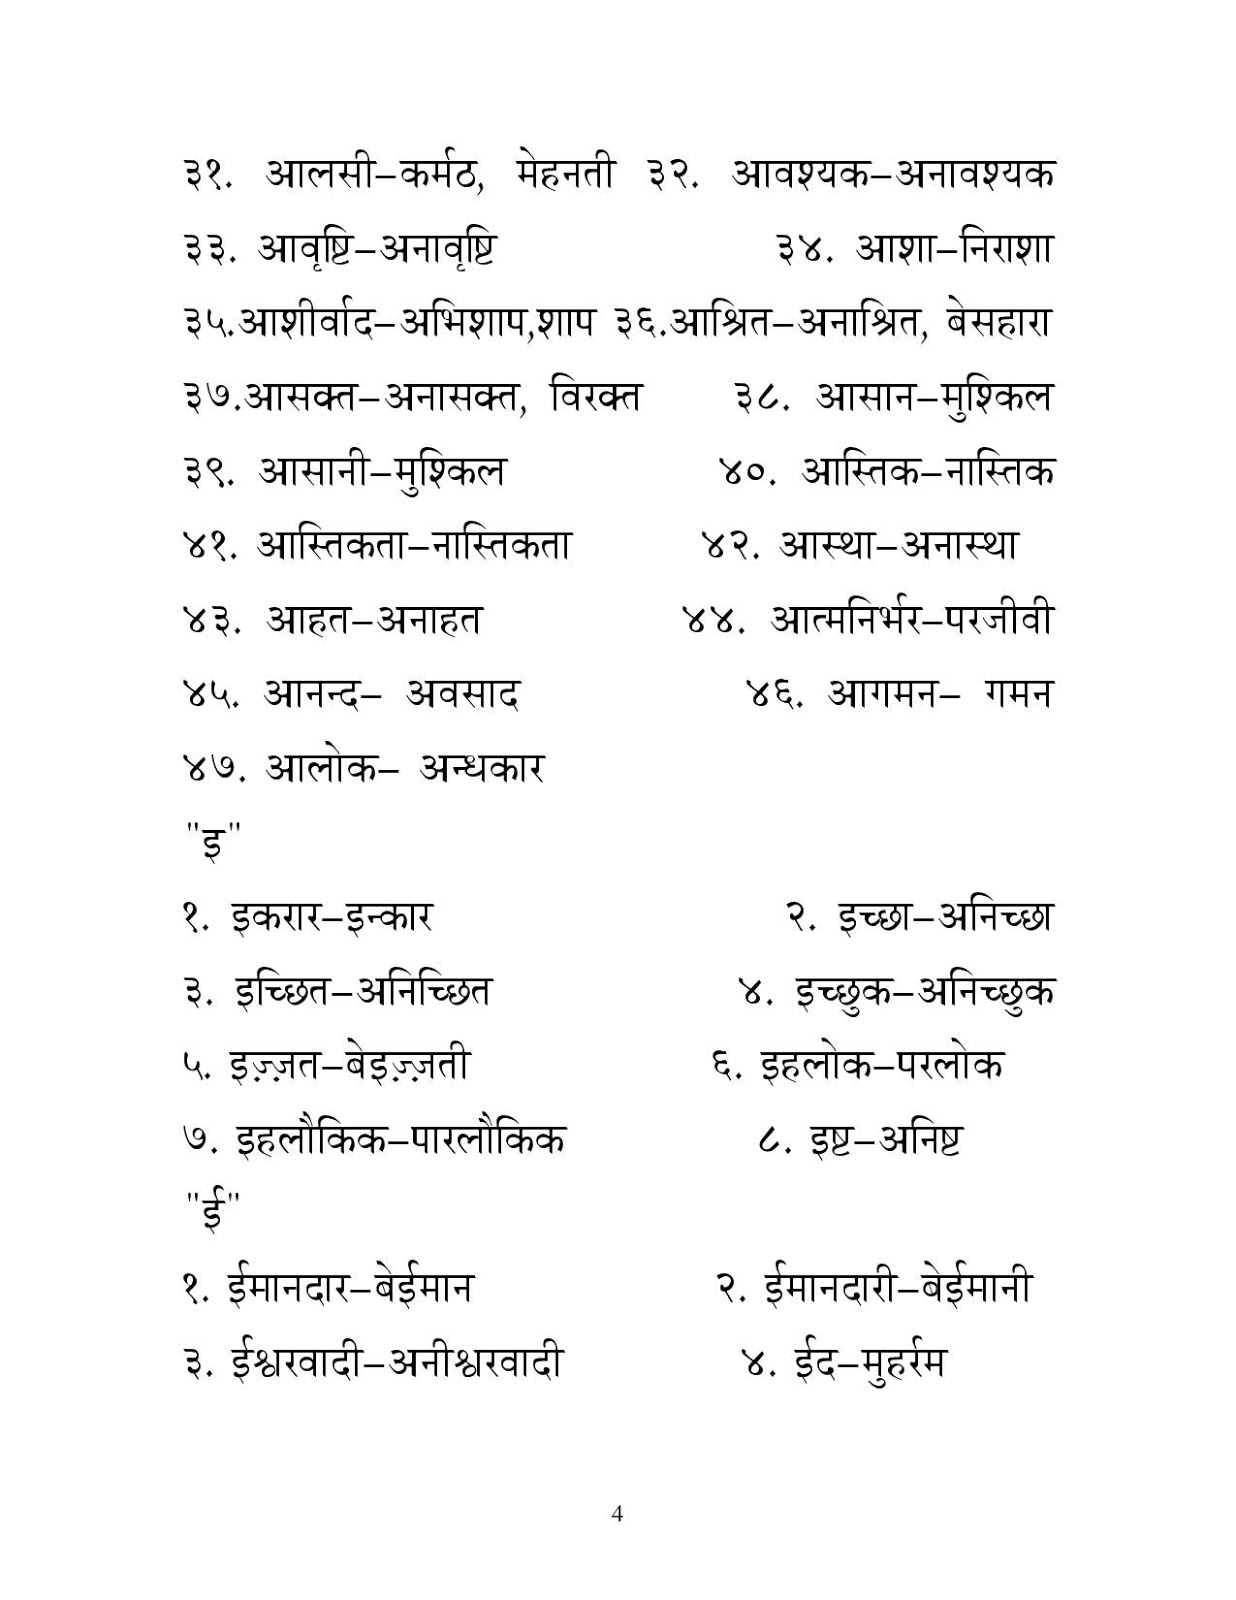 Free Worksheet For Icse Class 6 hindi grammar worksheets for class 6 icse  kendriya vidyalaya [ 1600 x 1236 Pixel ]